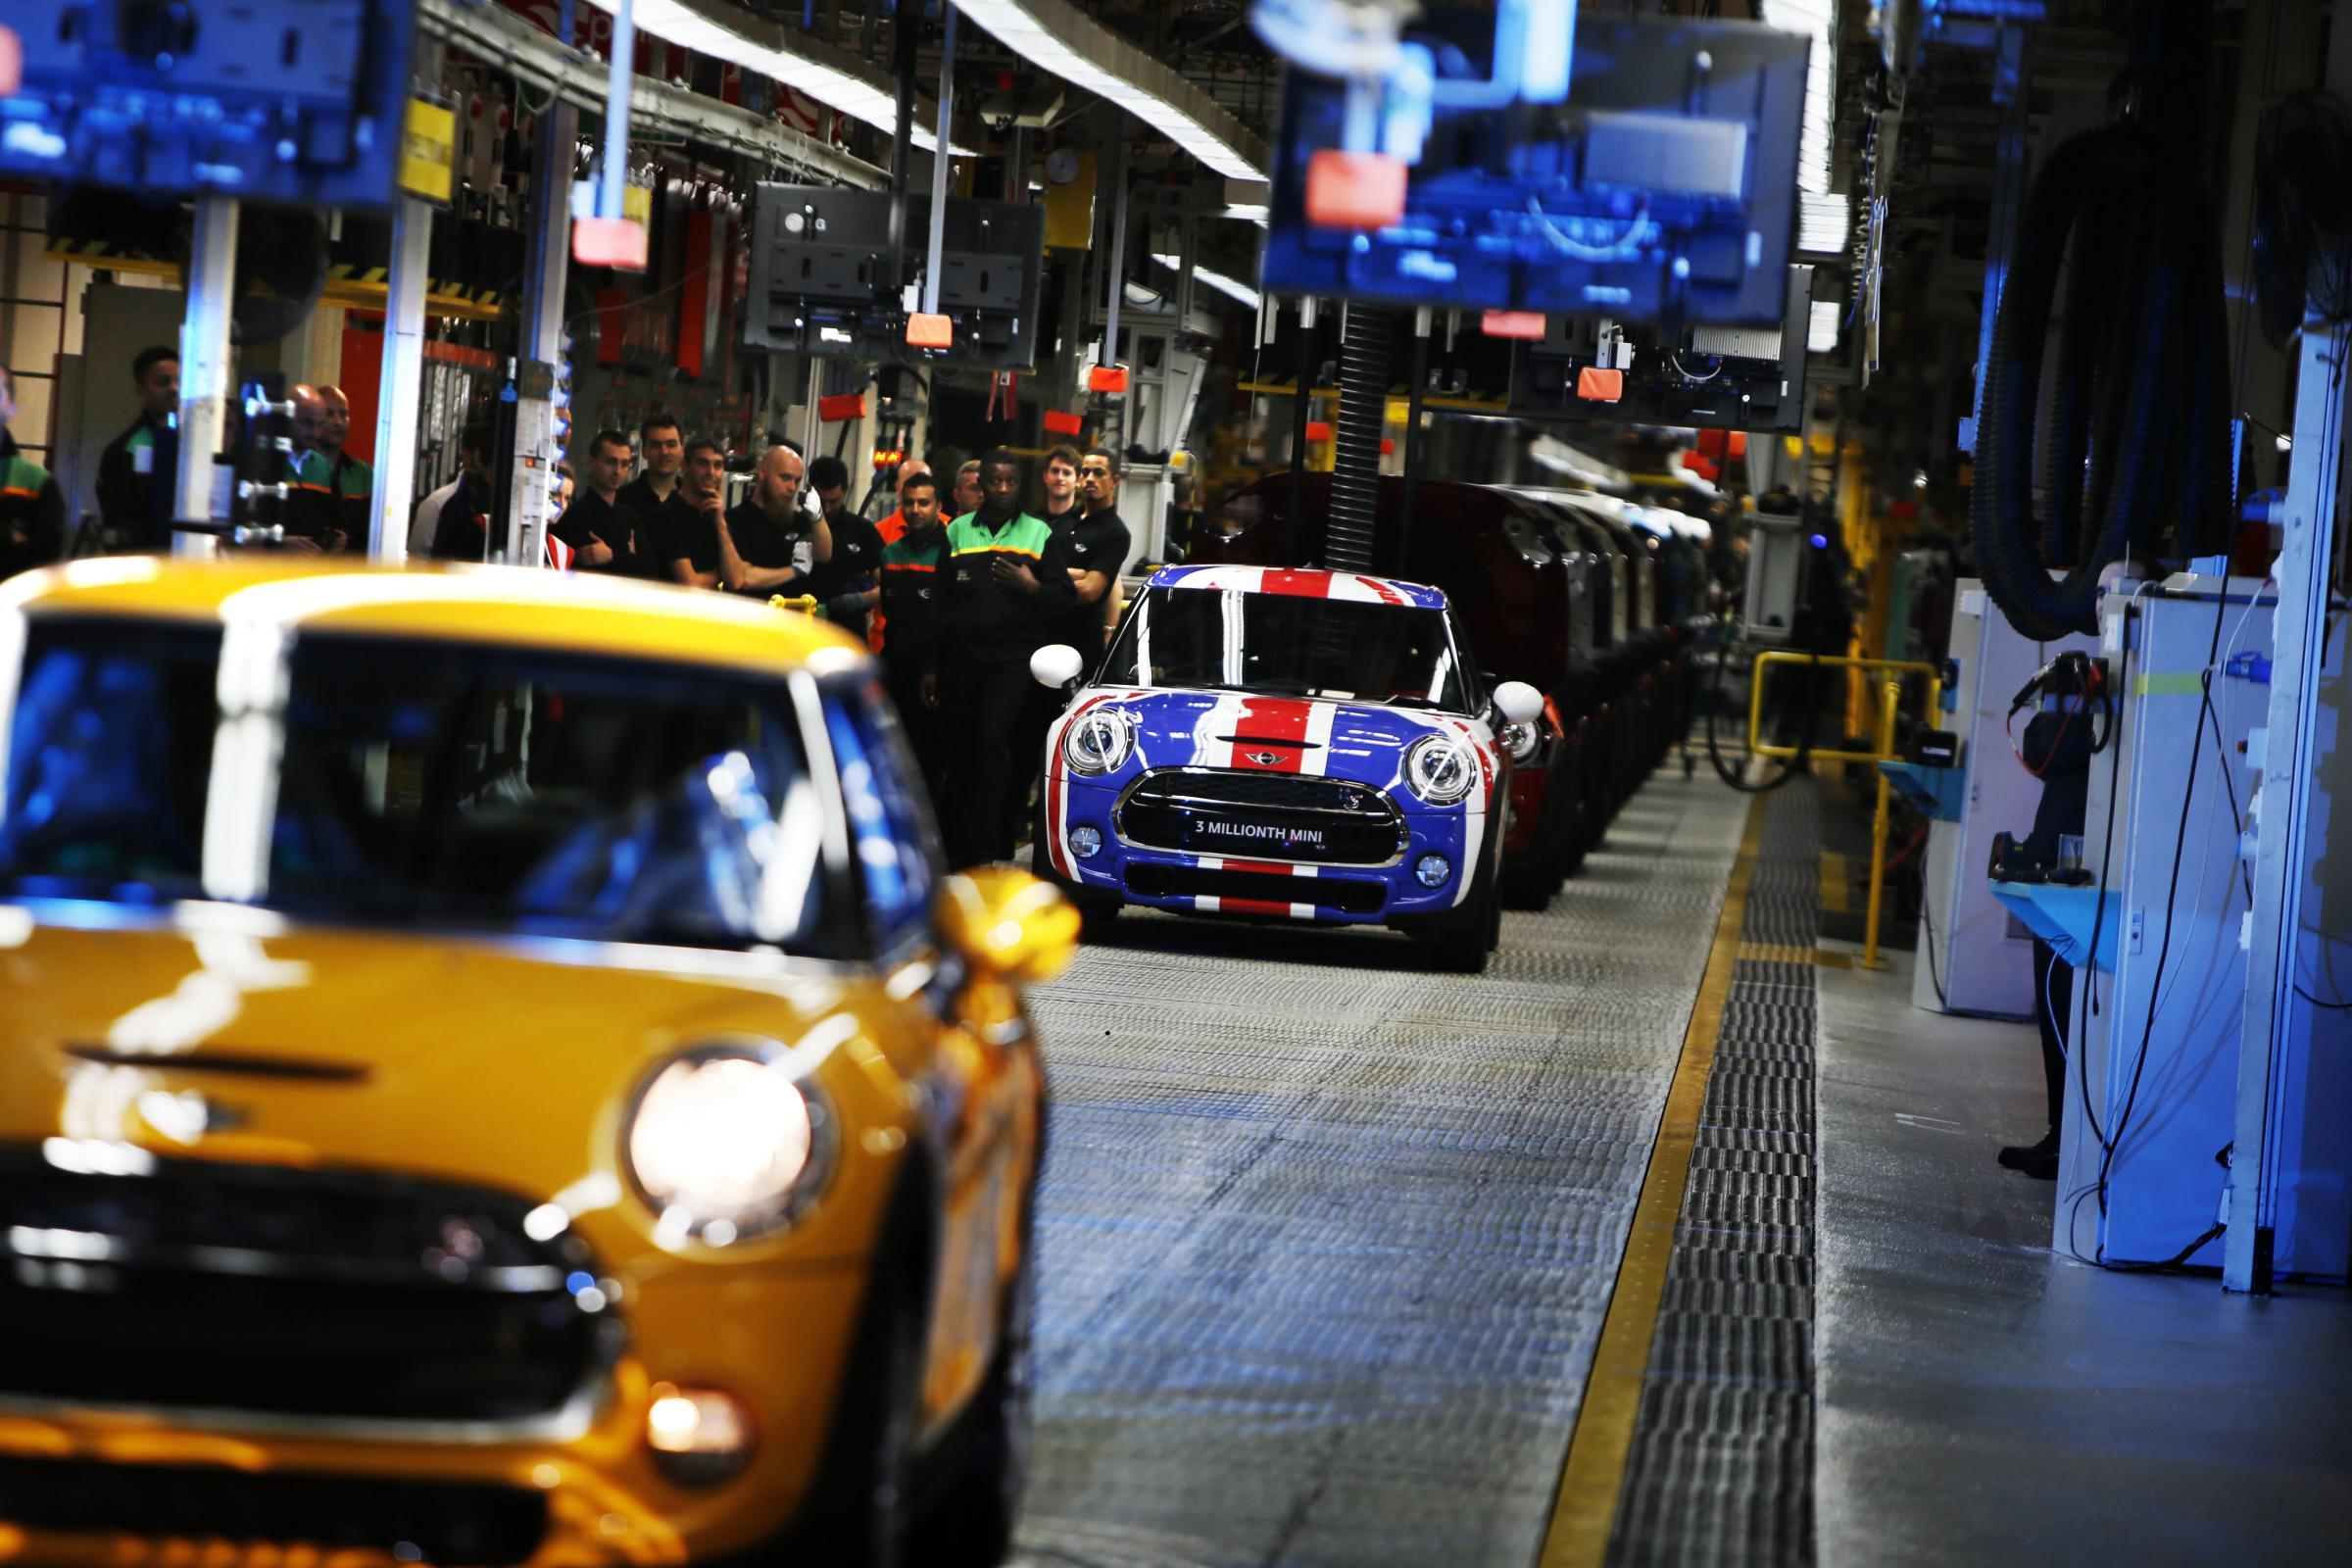 BMW Mini plant Cowley opens apprenticeship scheme for 2020